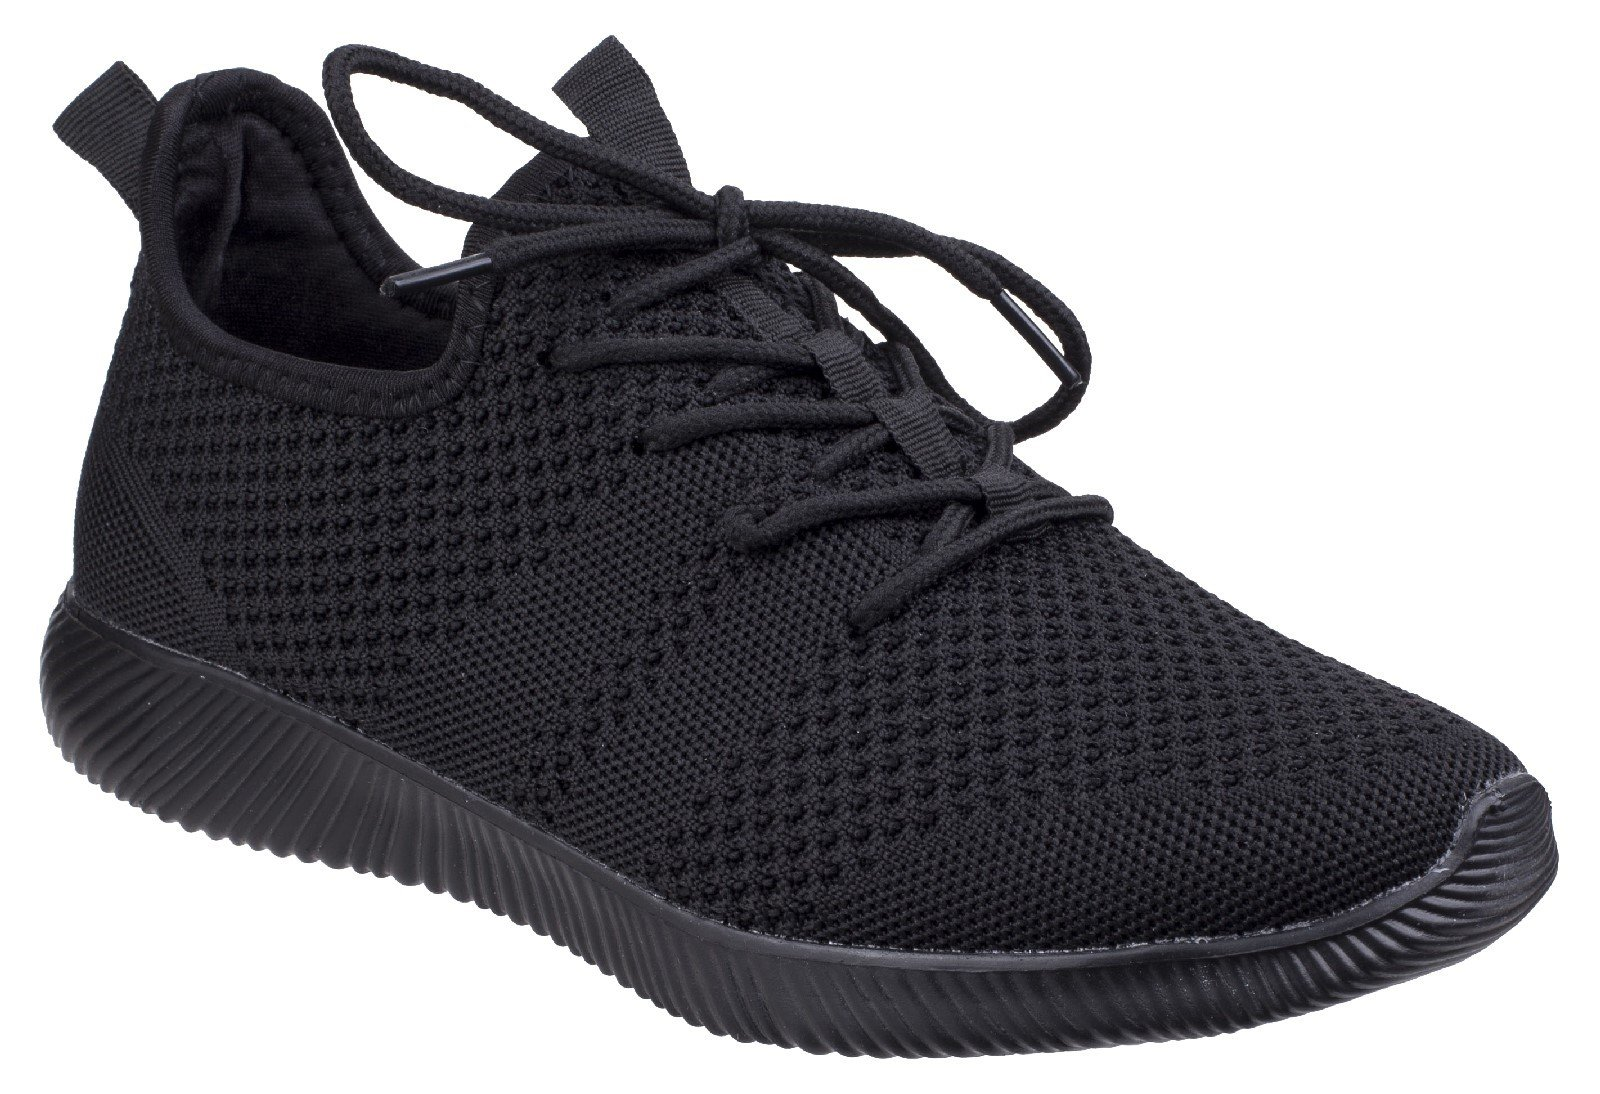 Divaz Women's Heidi Knit Trainer Grey 26327-43957 - Black 3